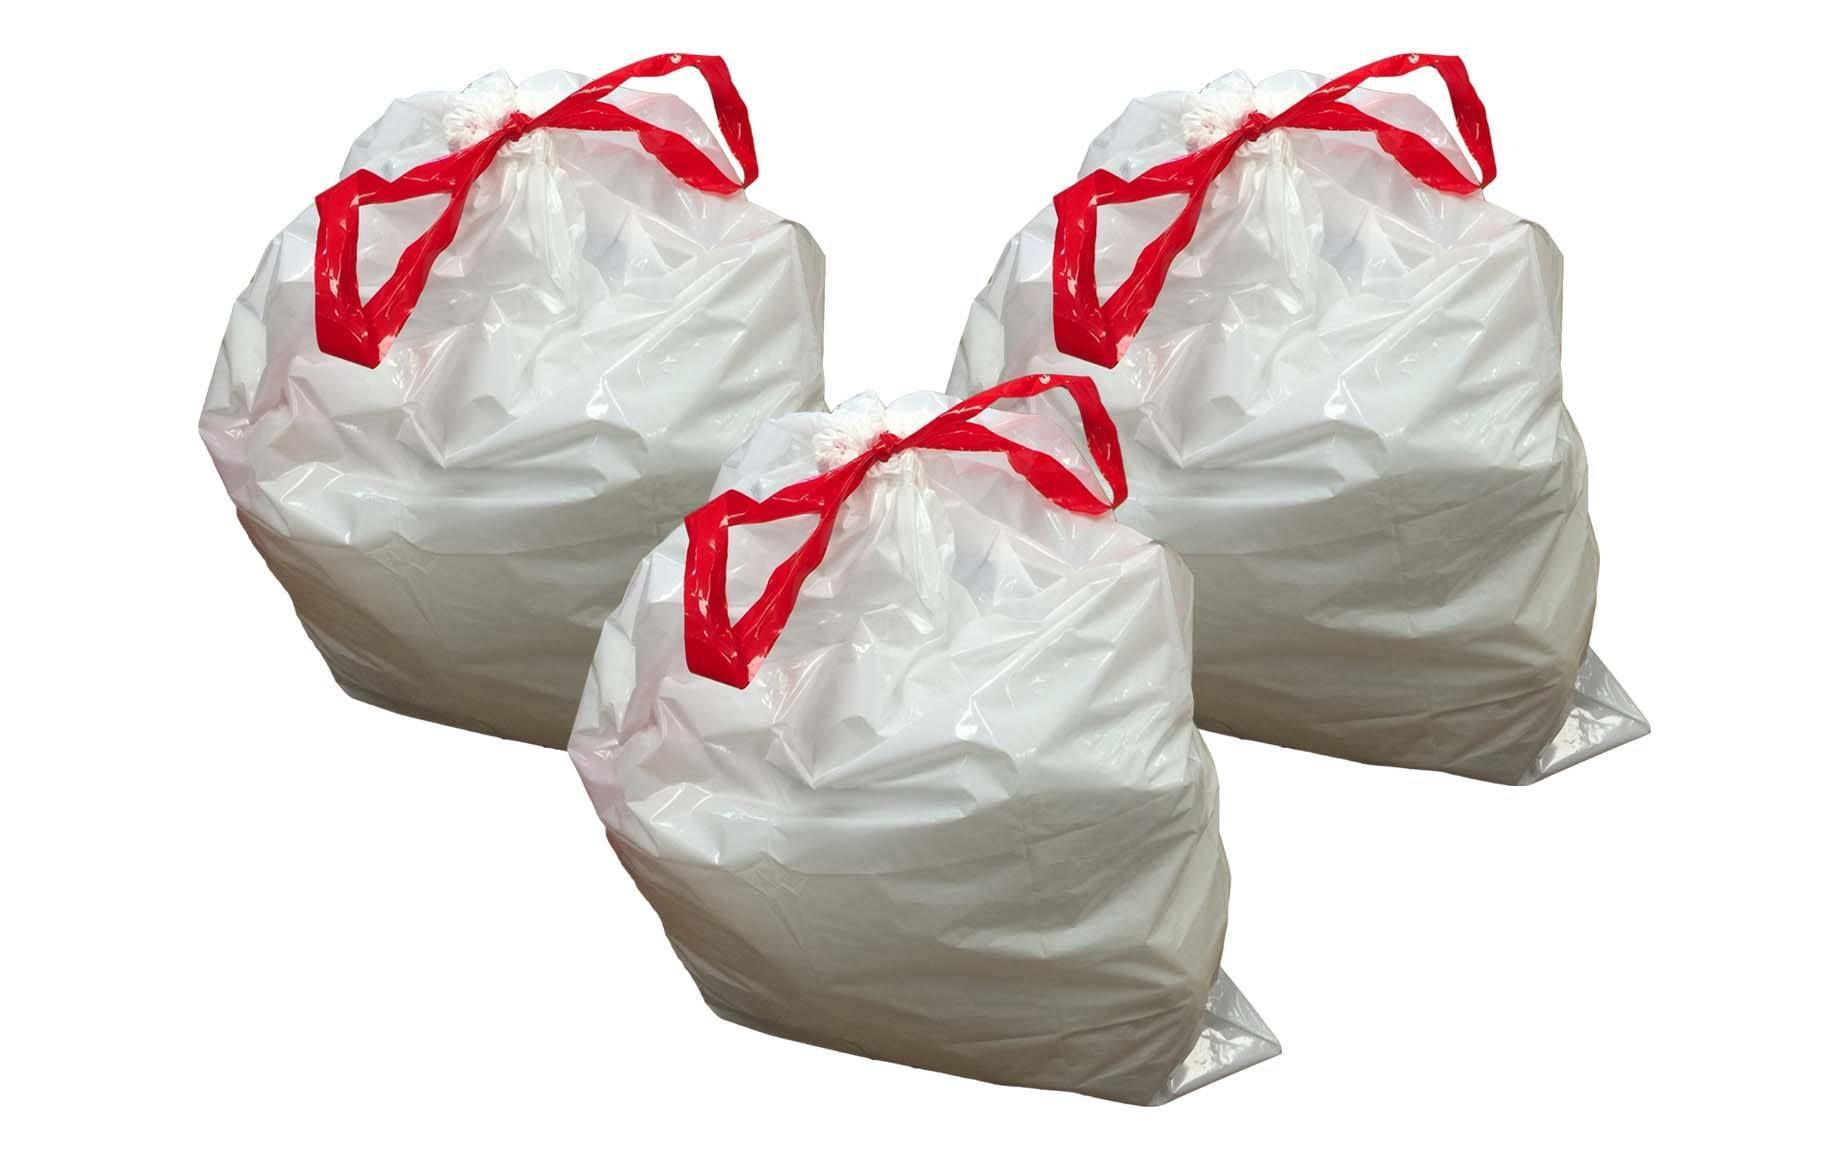 Replacement Garbage Bags Fits Simplehuman Trash Bins 50